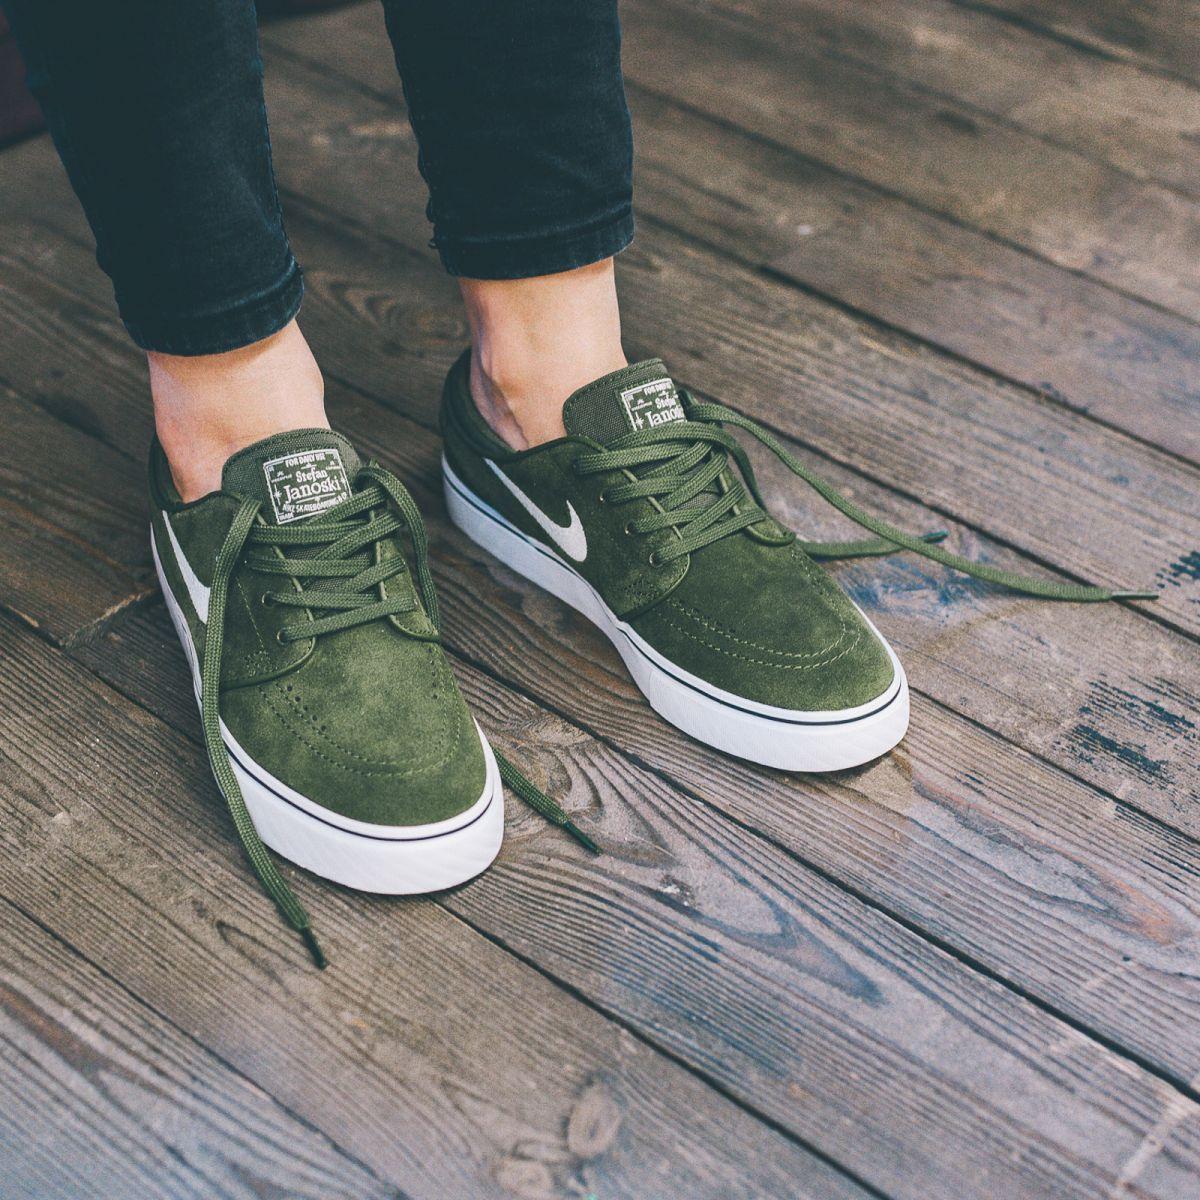 Nike Sb Zoom Stefan Janoski 333824 310 Fashion Shoes Sneakers Casual Sneakers Shoes